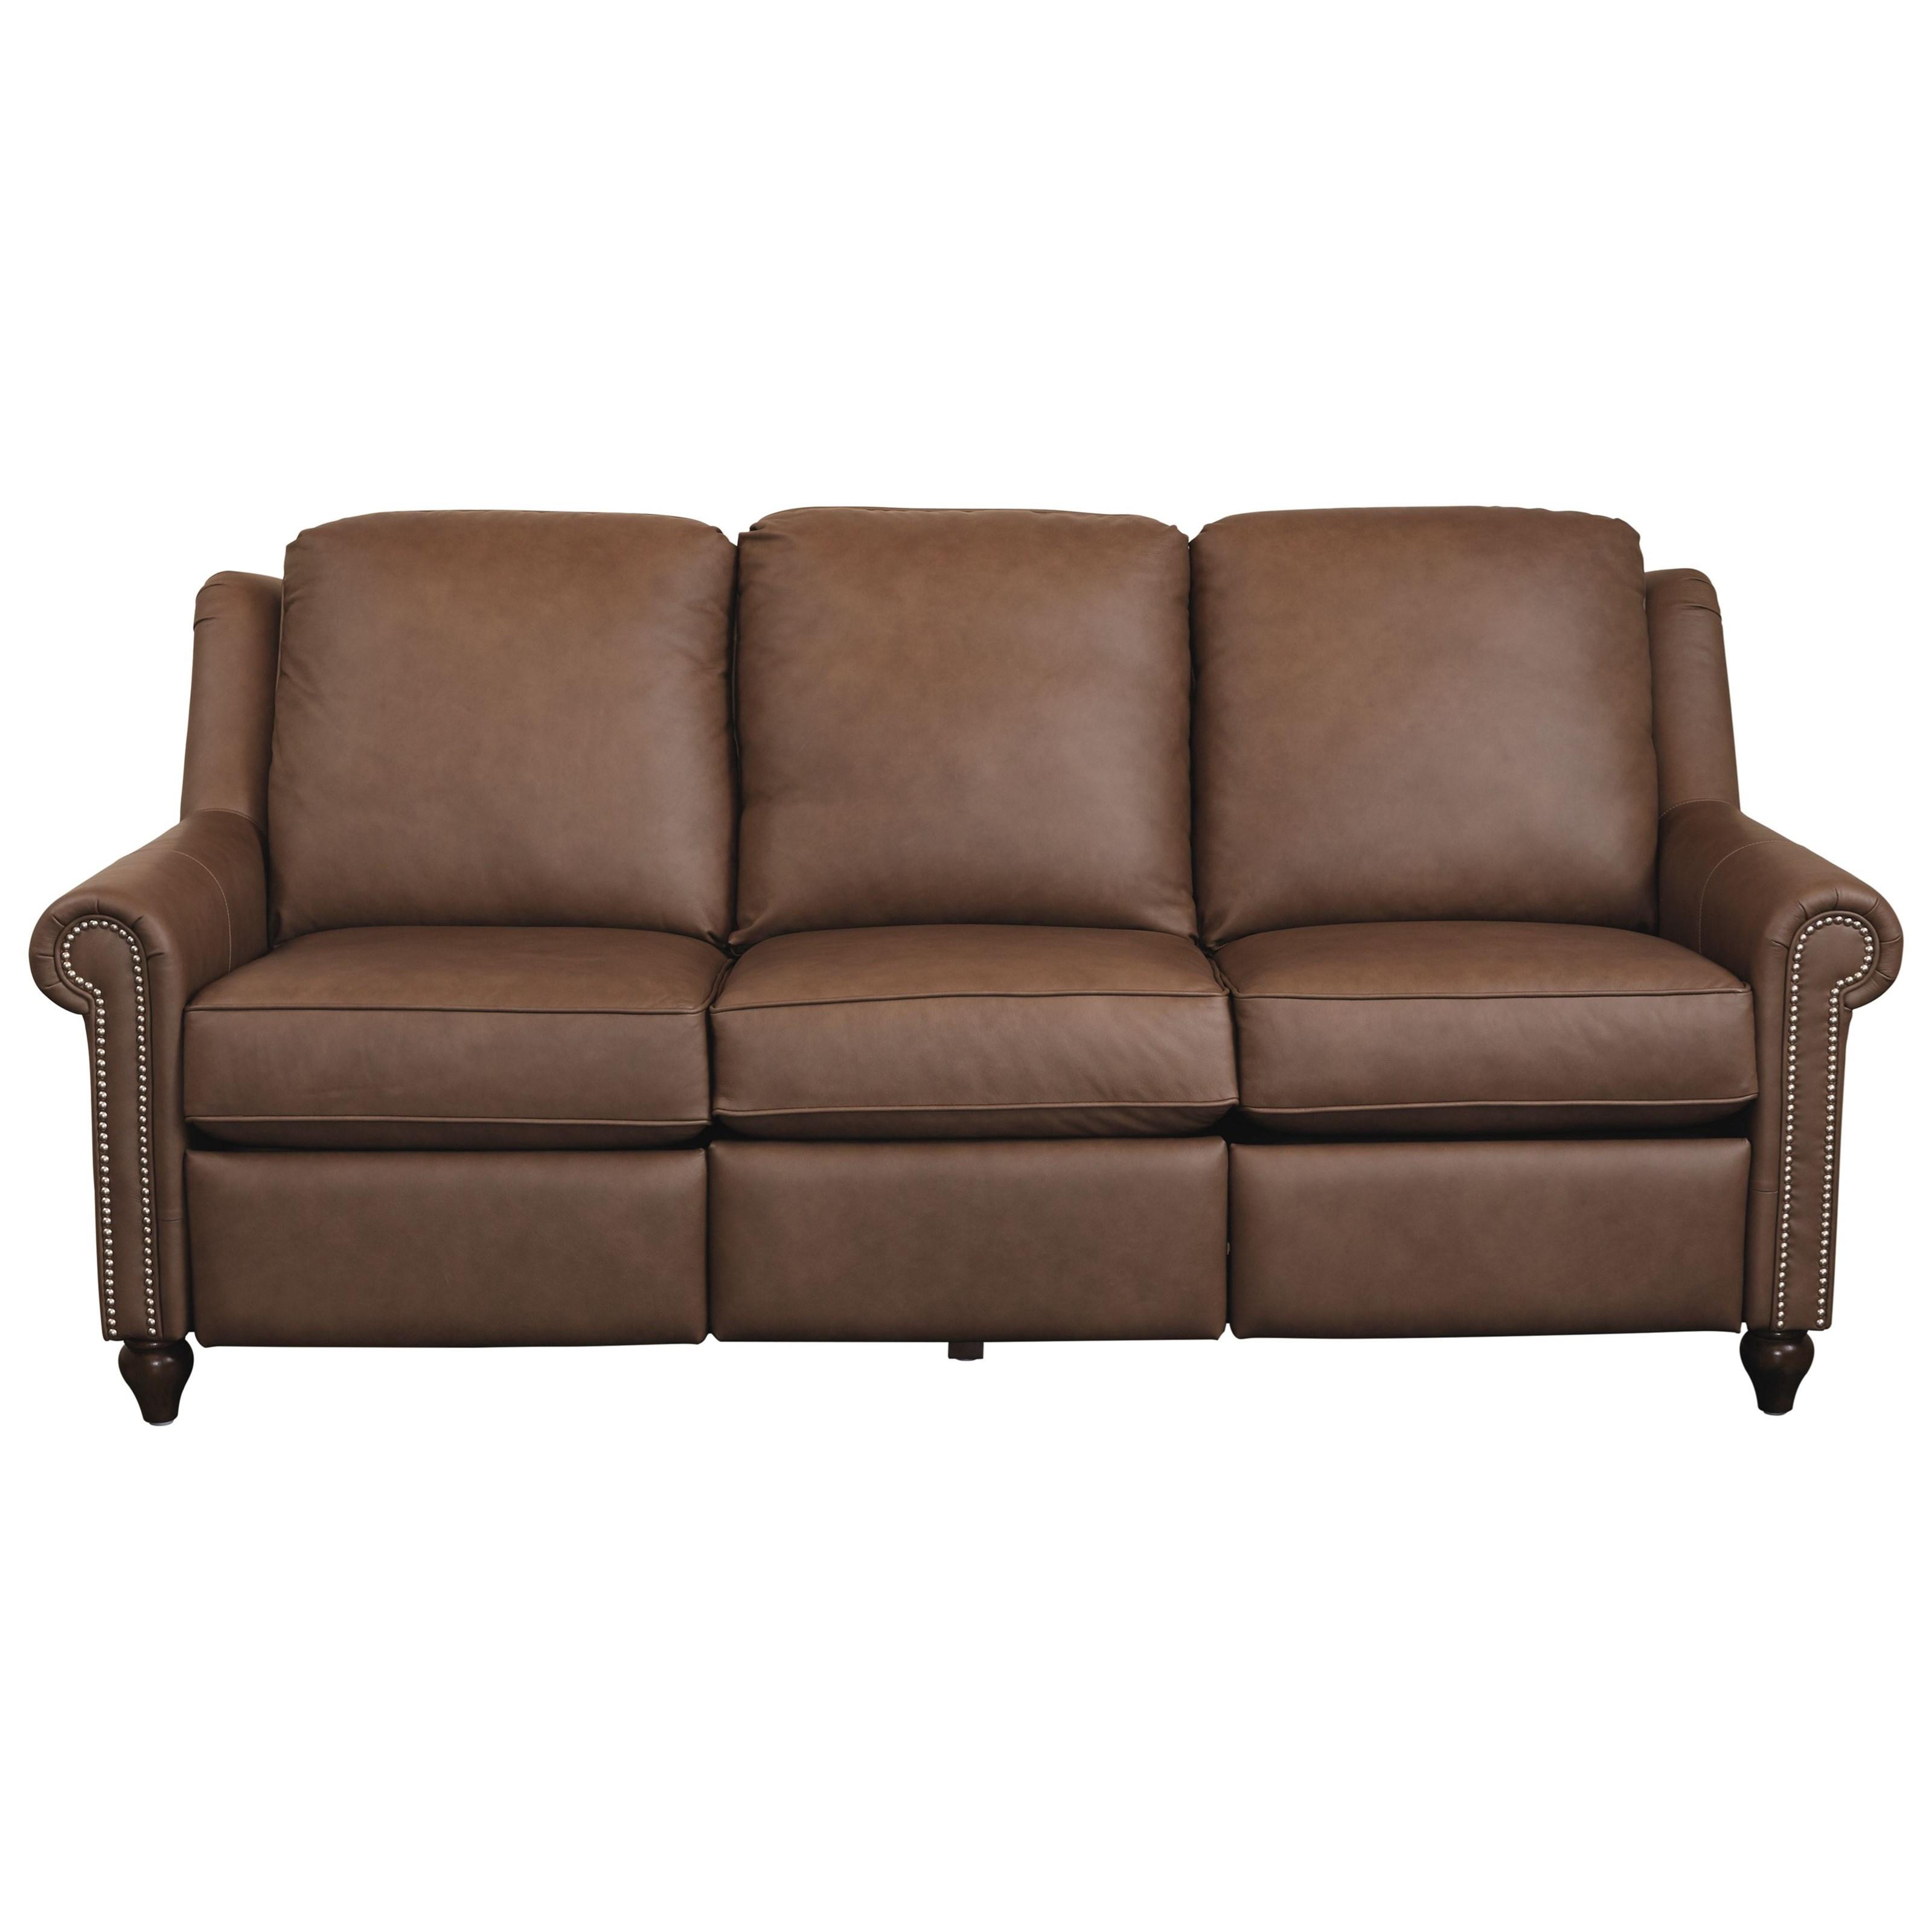 Customizable Power Reclining Sofa